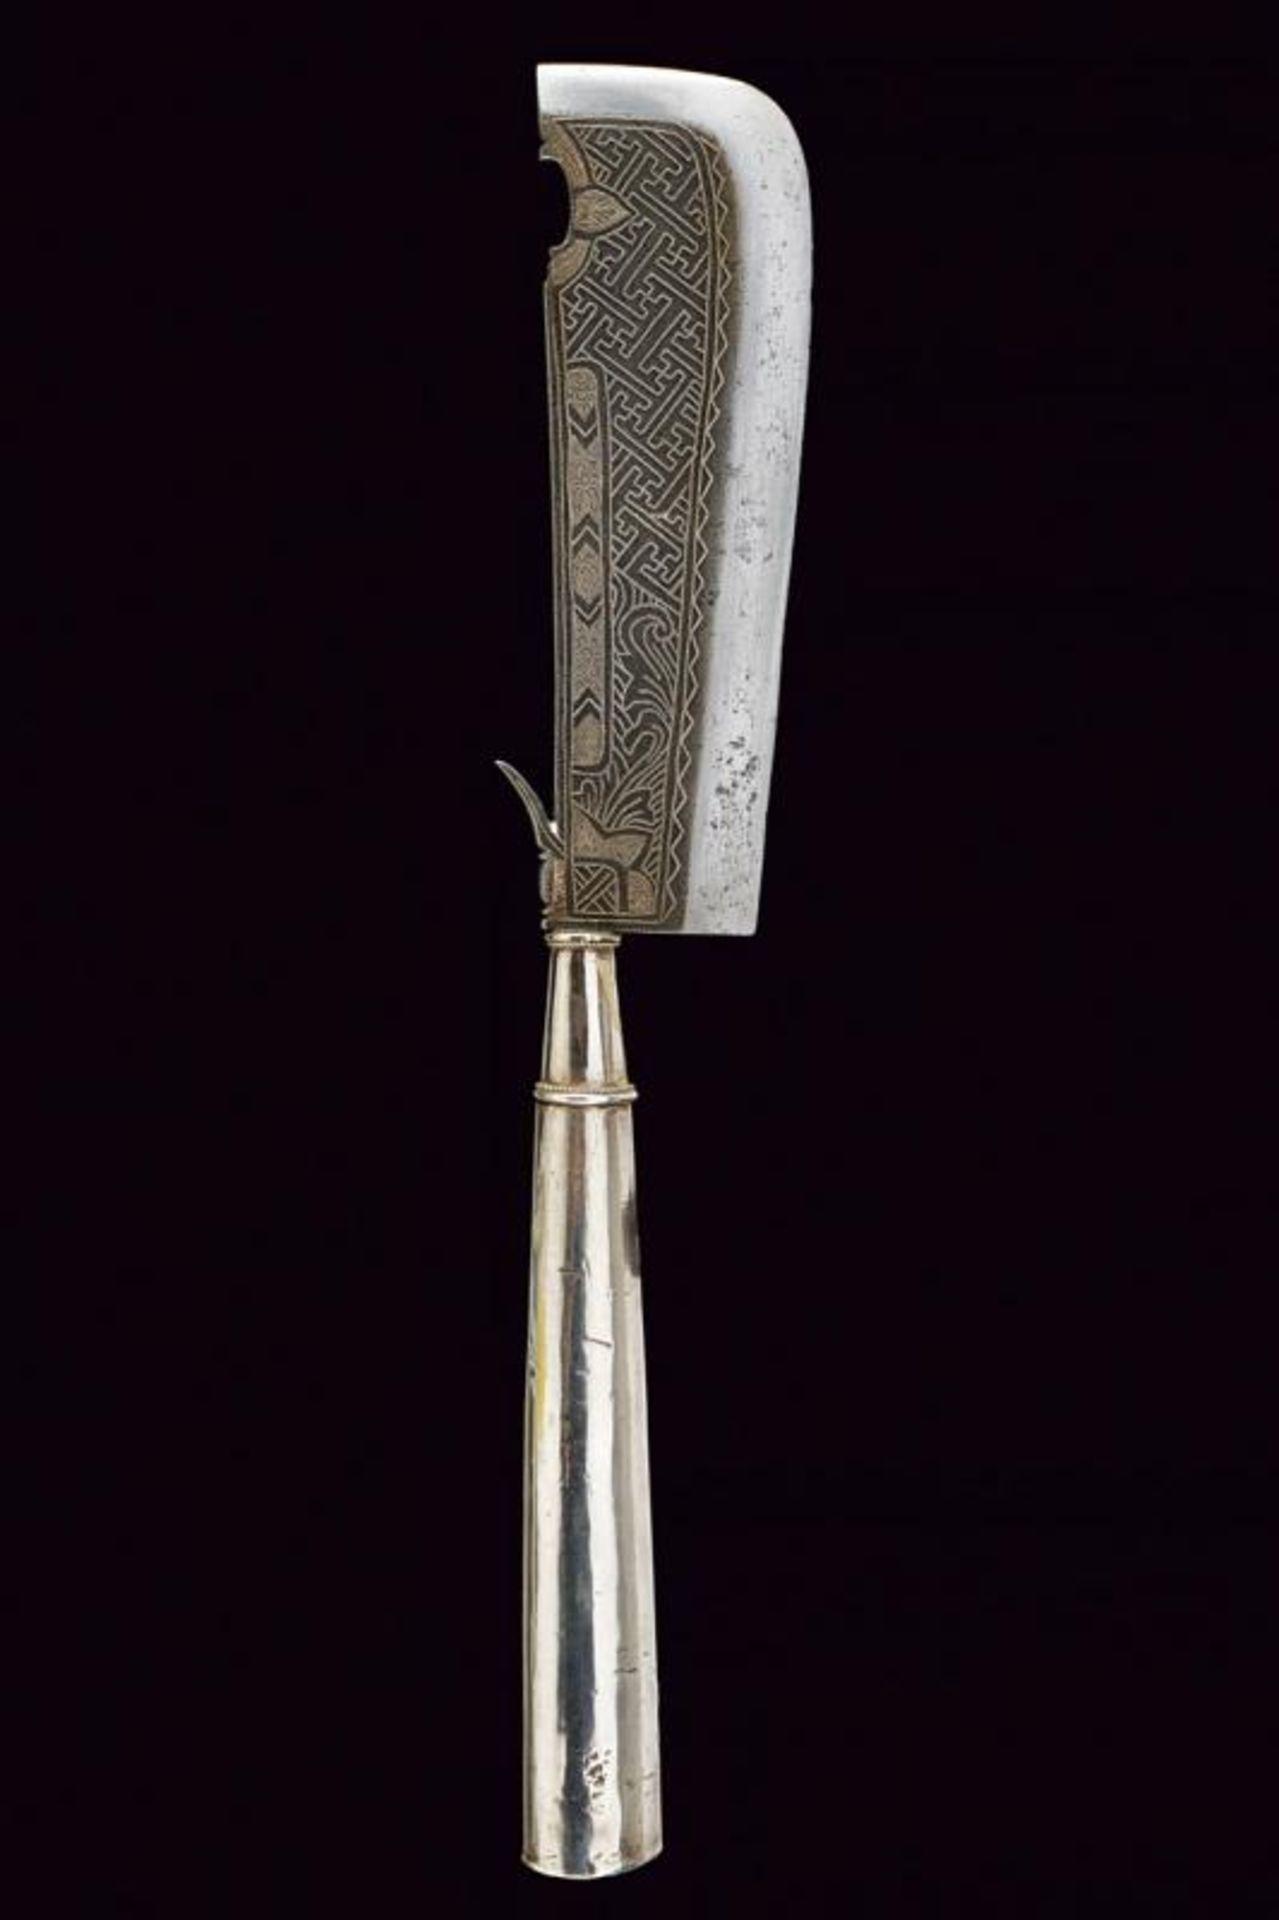 A ceremonial axe with silver hilt - Bild 6 aus 6